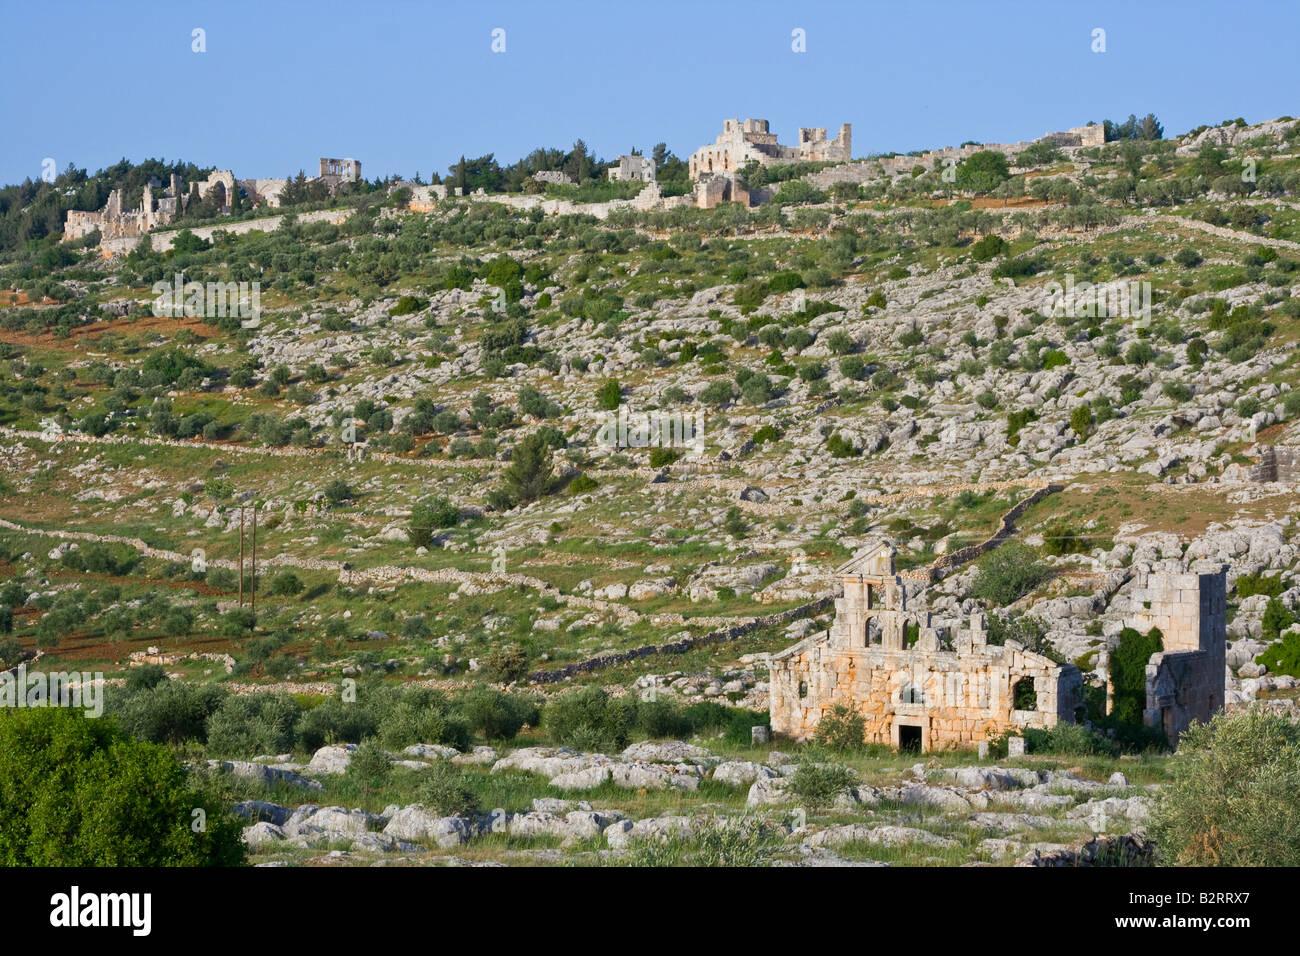 Saint Simeon Ruins and Cathedral Ruins at at Deir Samaan Dead City in Syria - Stock Image